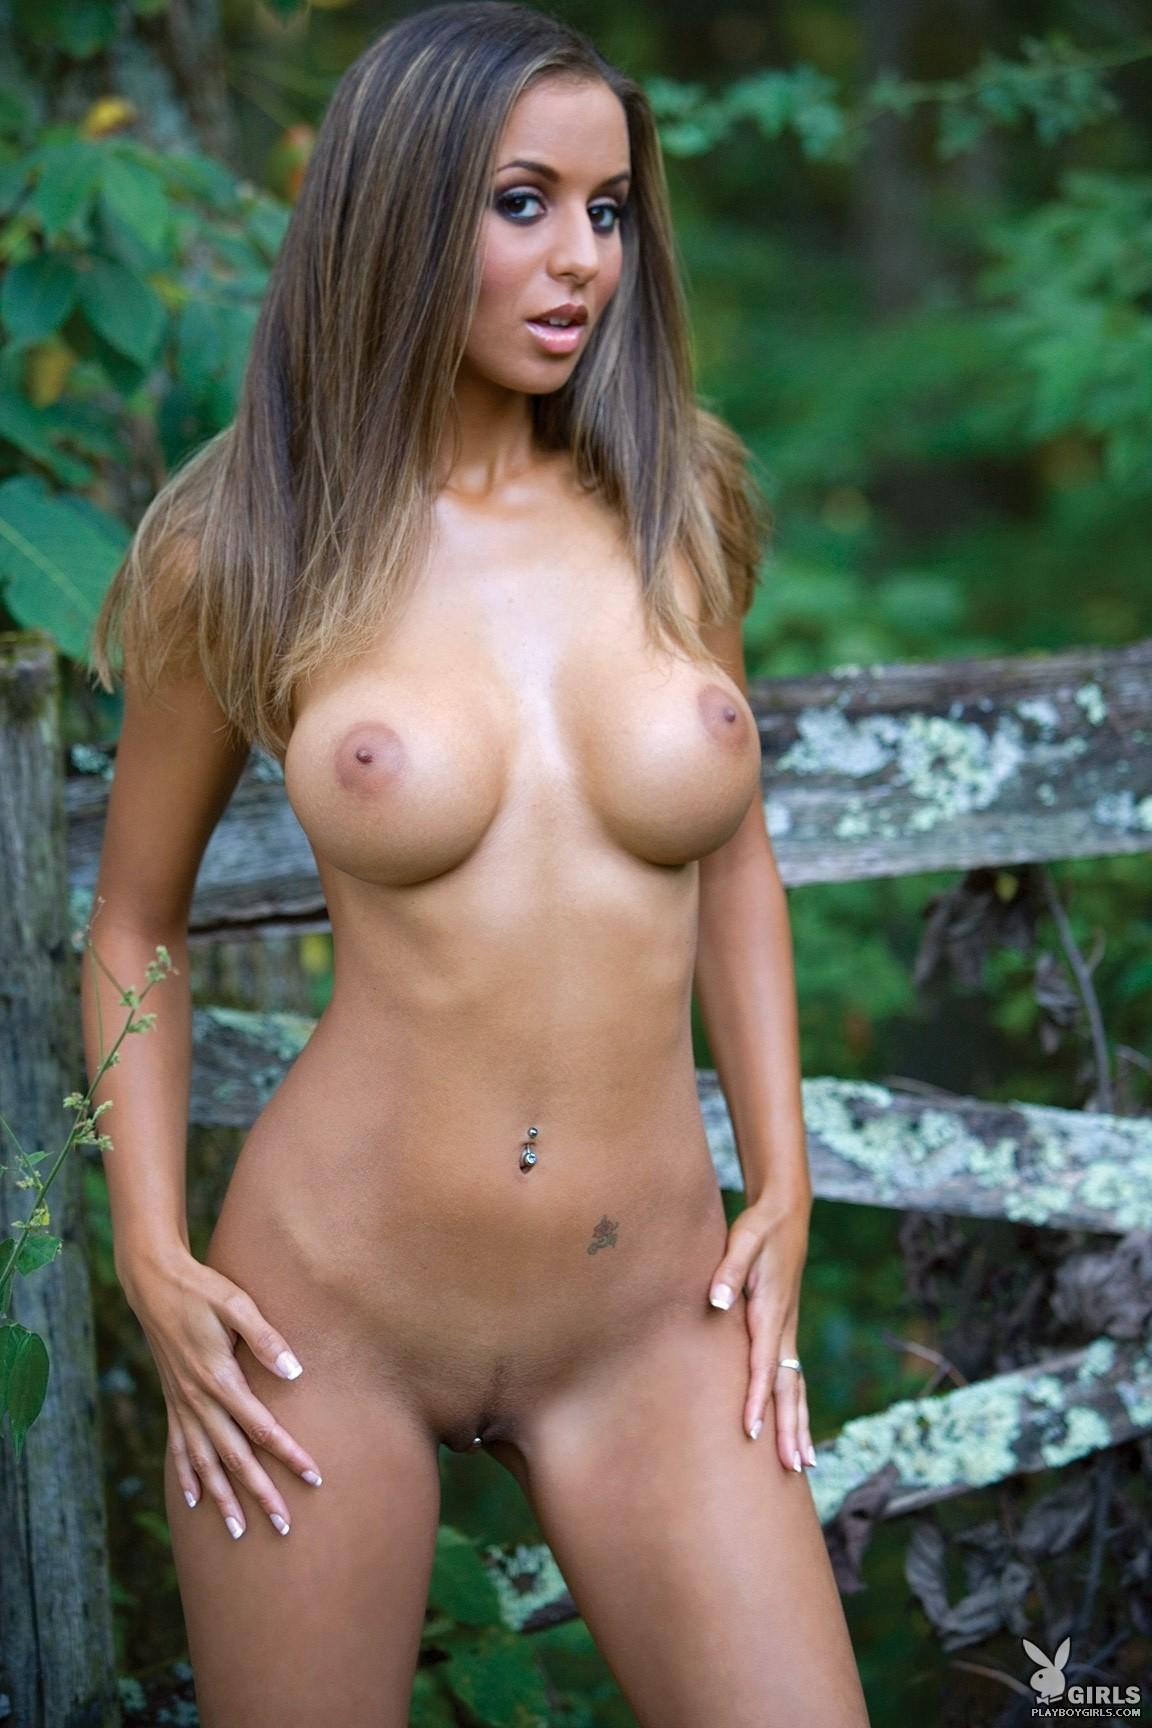 andrea naked videos jpg 853x1280